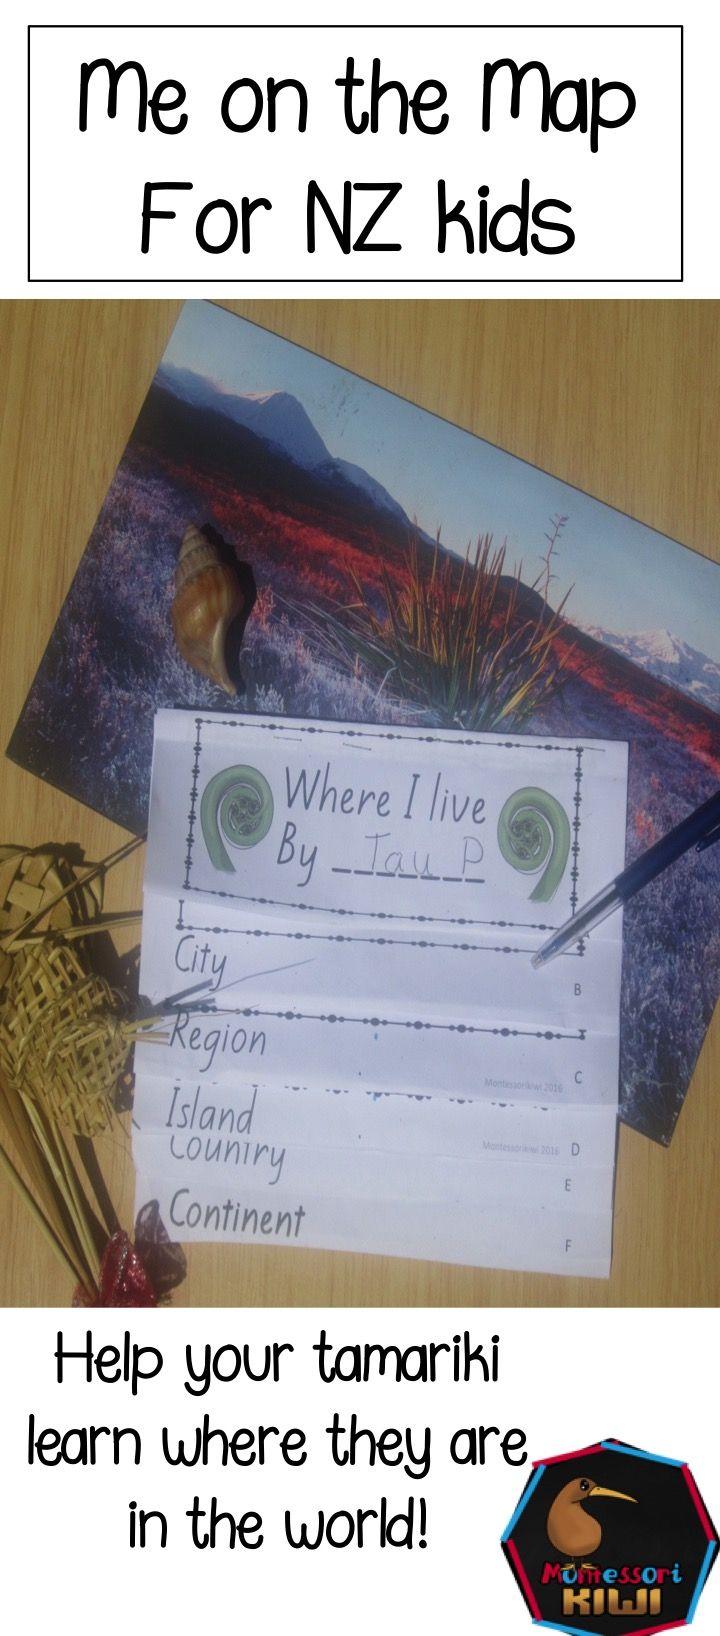 Māori perspectives